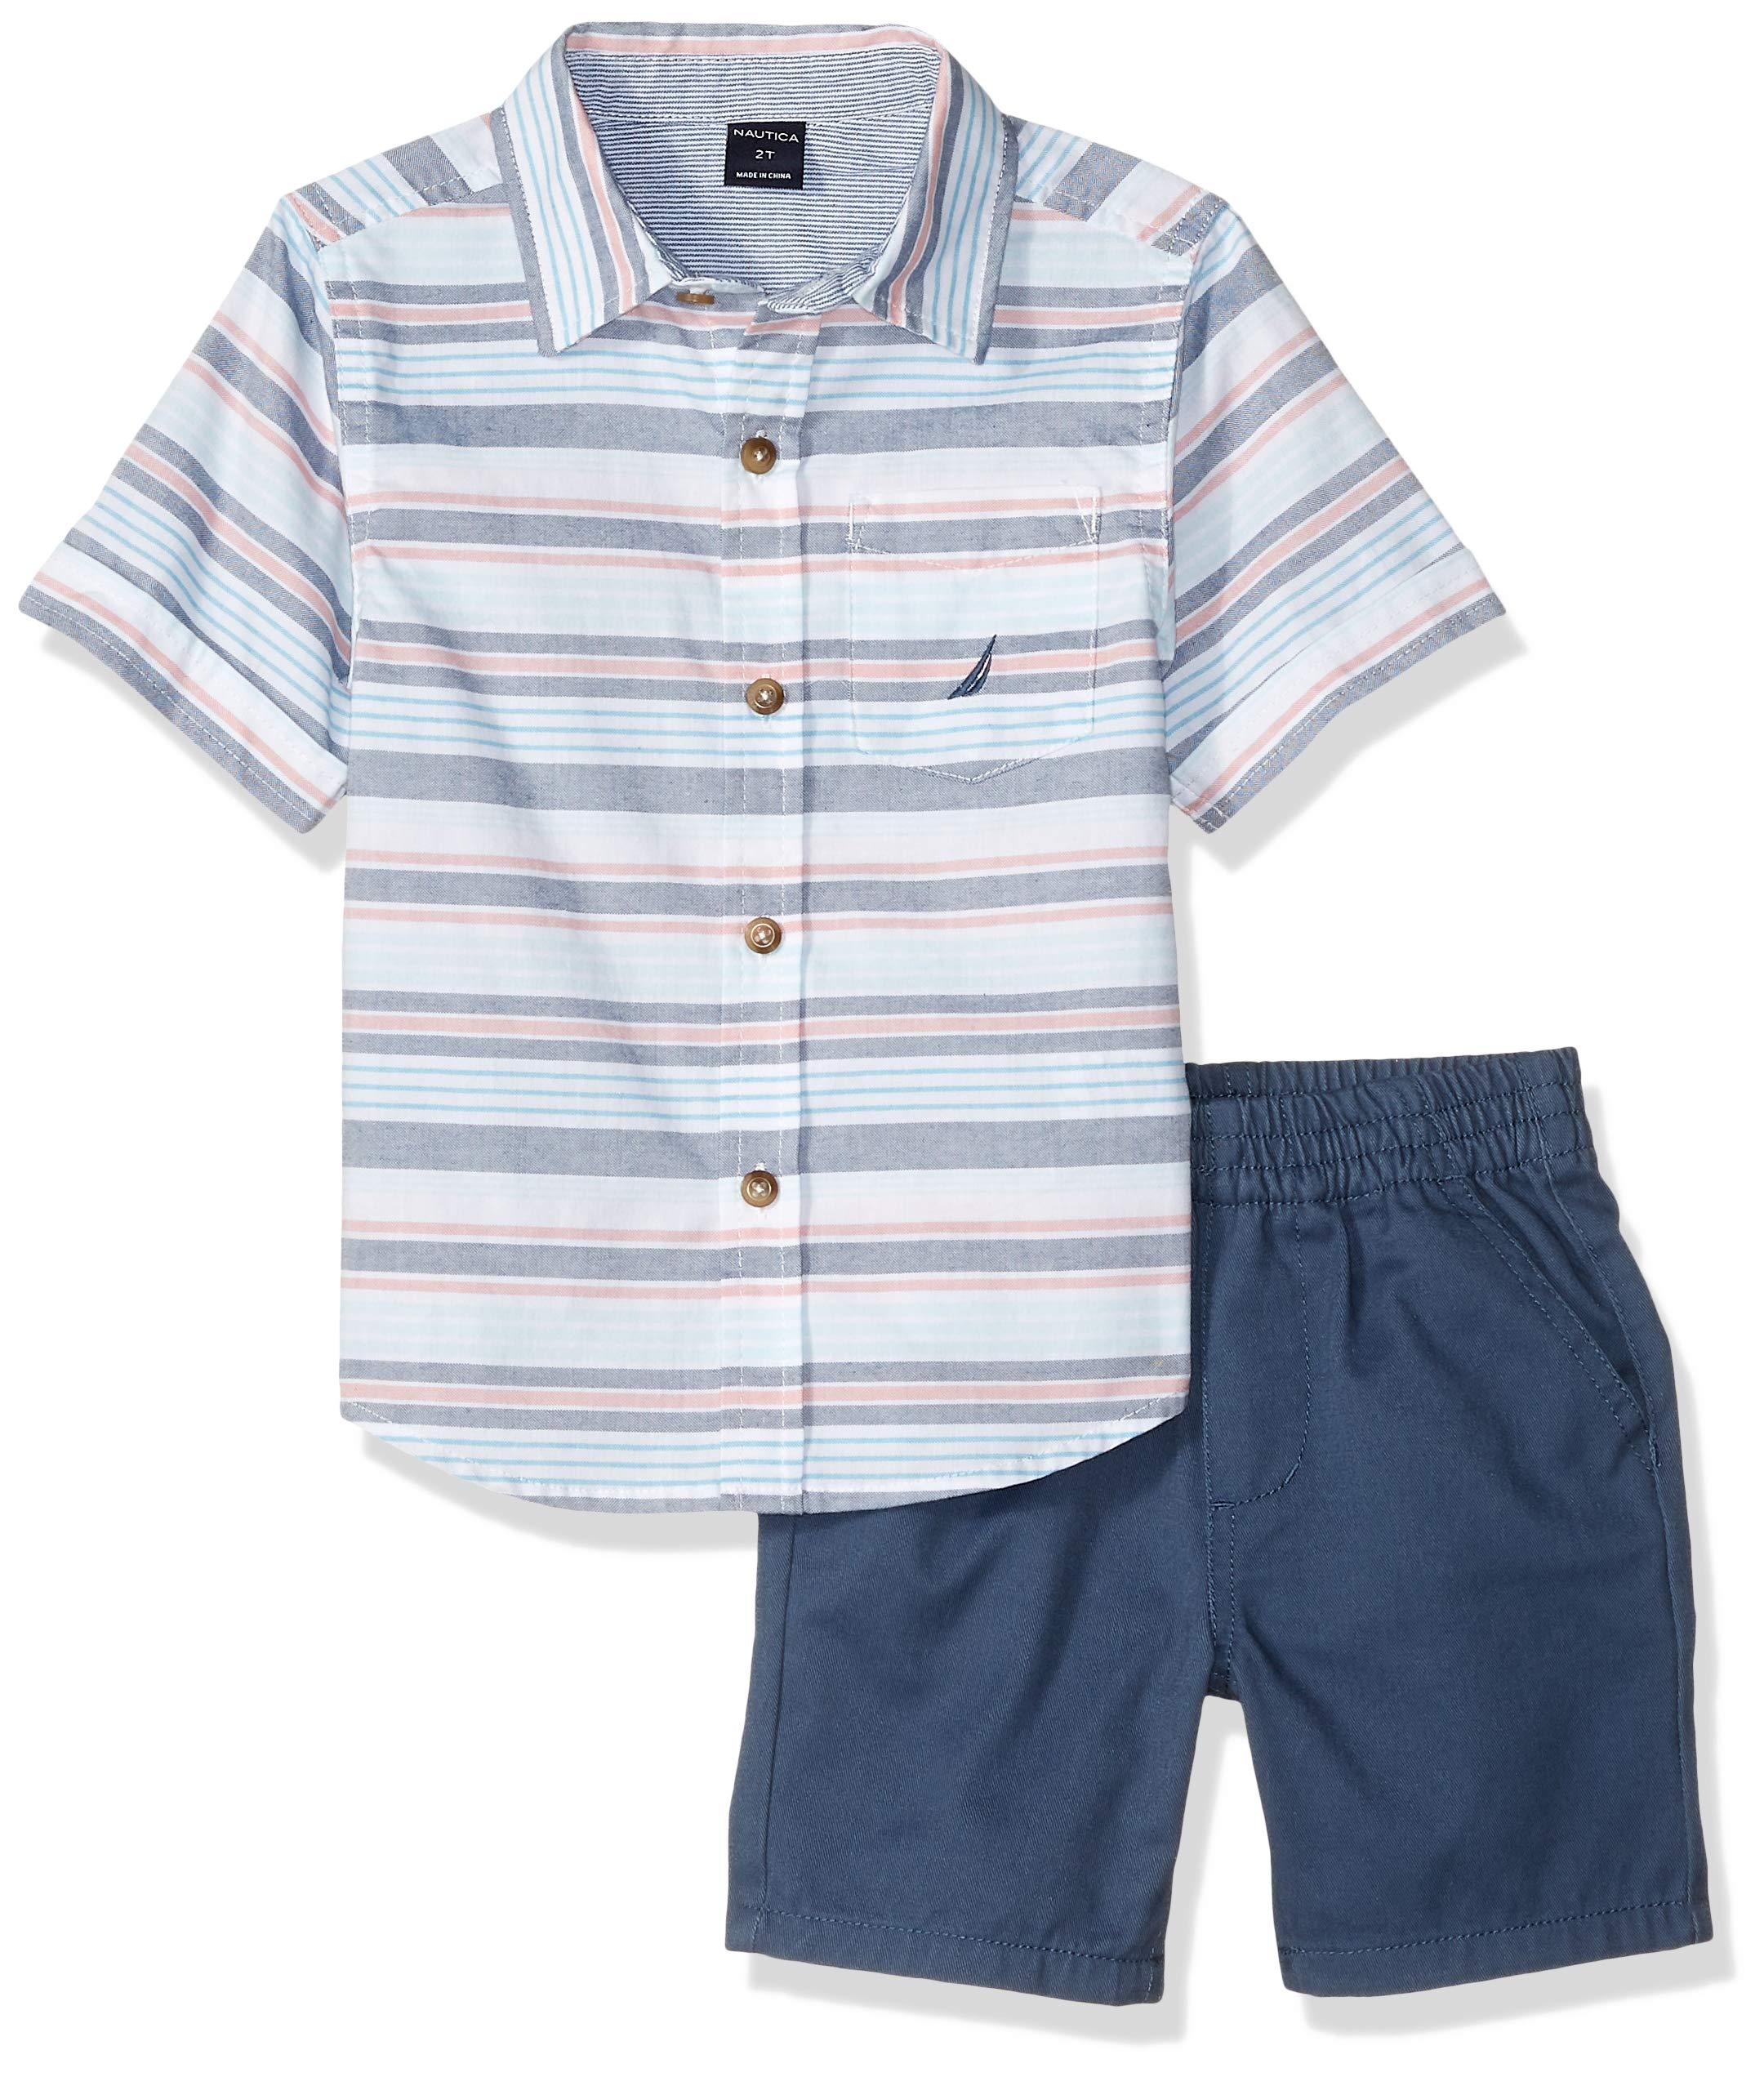 Nautica Sets (KHQ) Boys' Little 2 Pieces Shirt Shorts Set, Stripes/Blue, 7